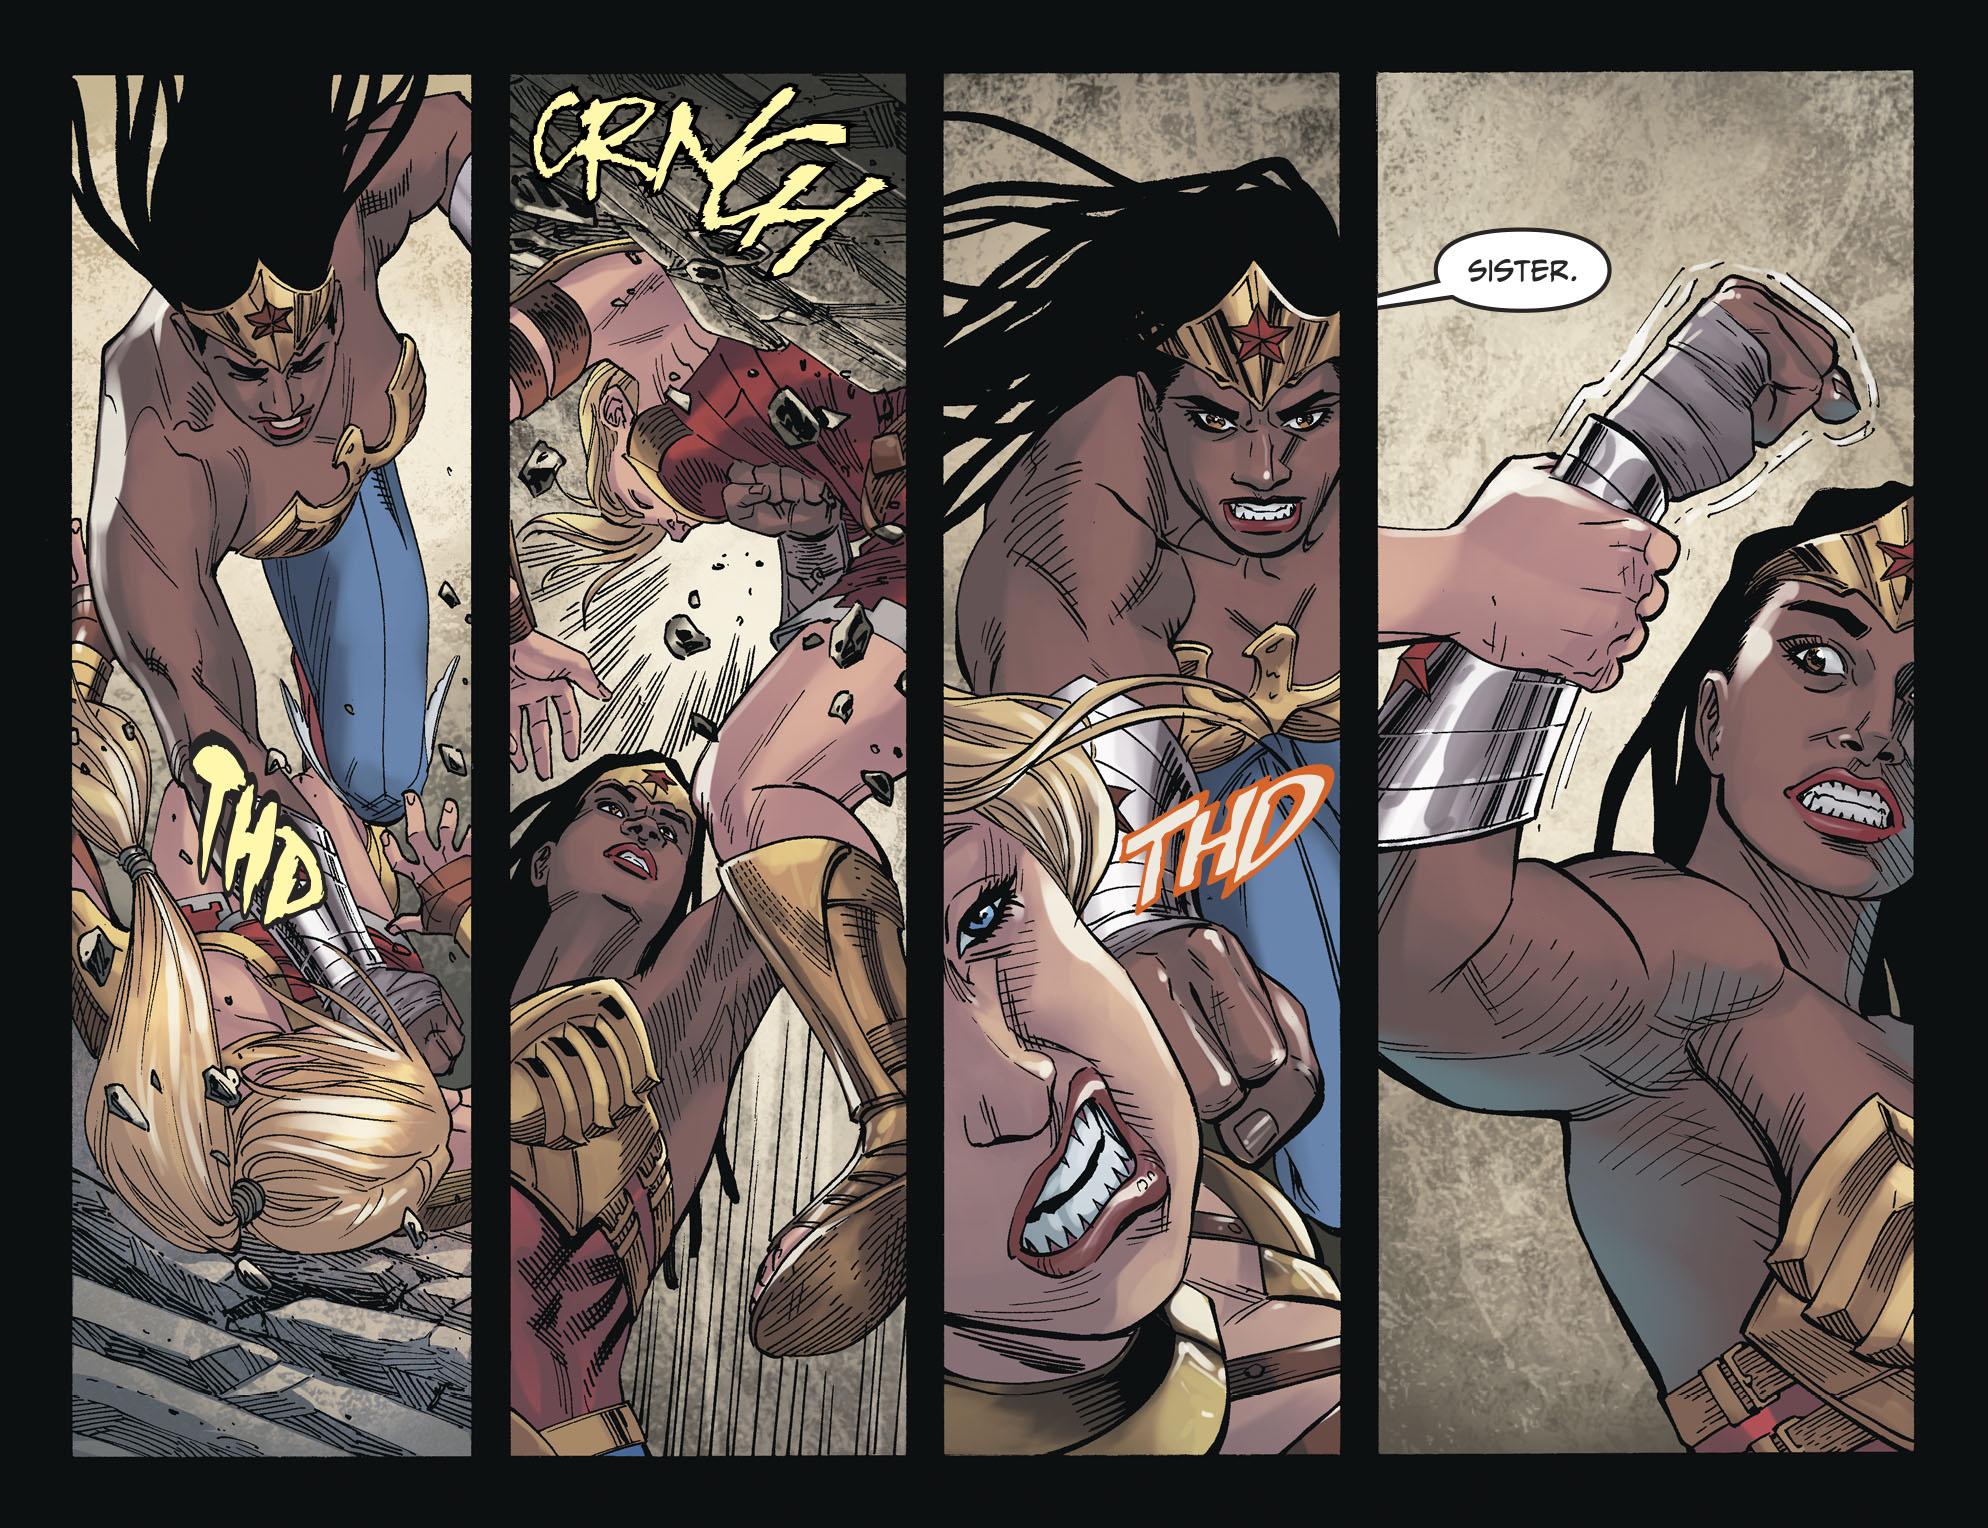 Supergirl And Wonder Woman VS Nubia (Injustice II)